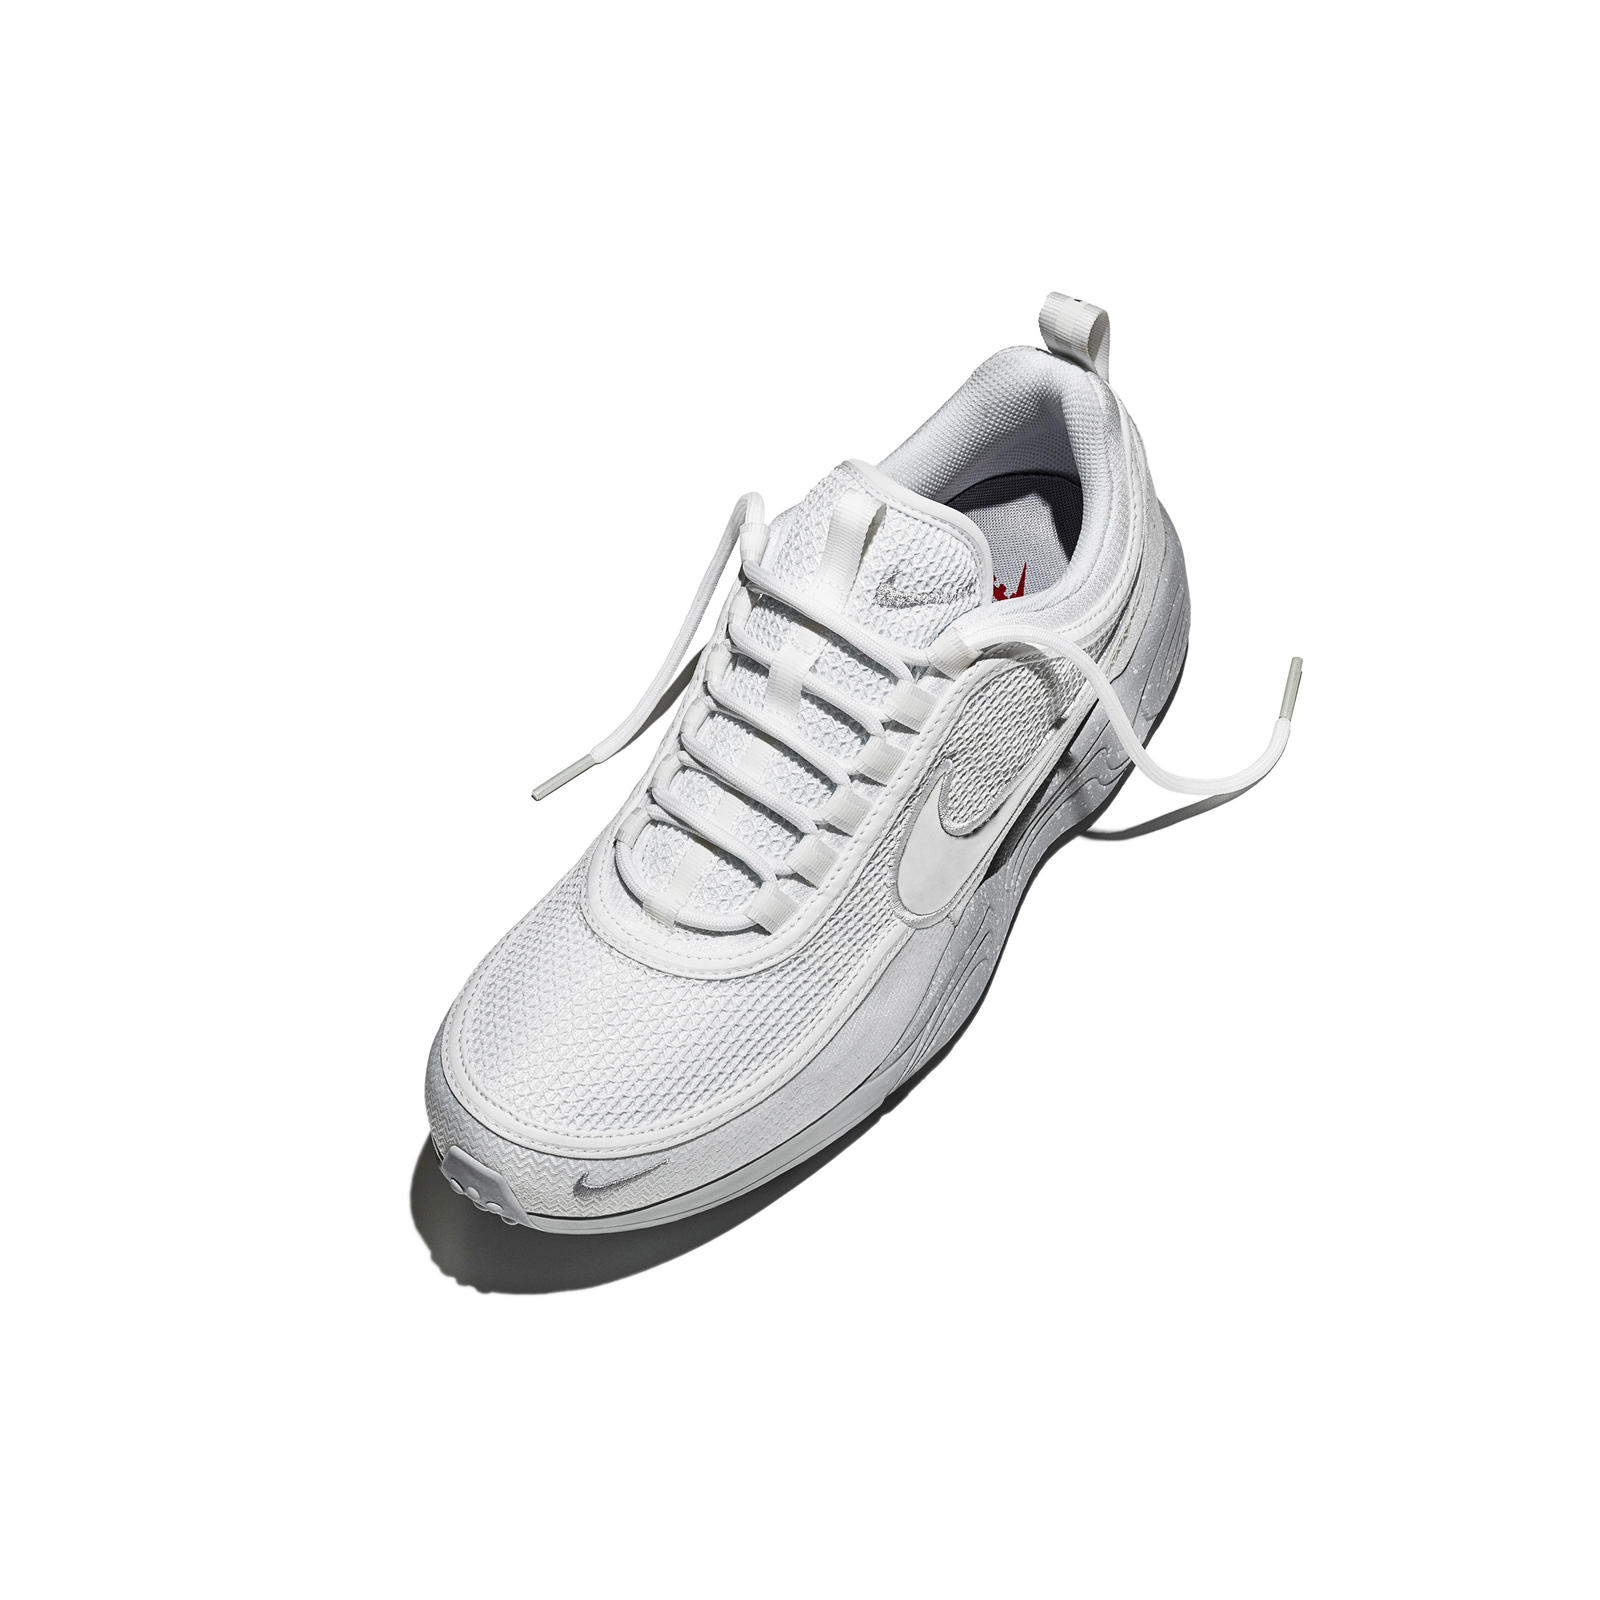 Nike_LAB_Spiridon_whtgry